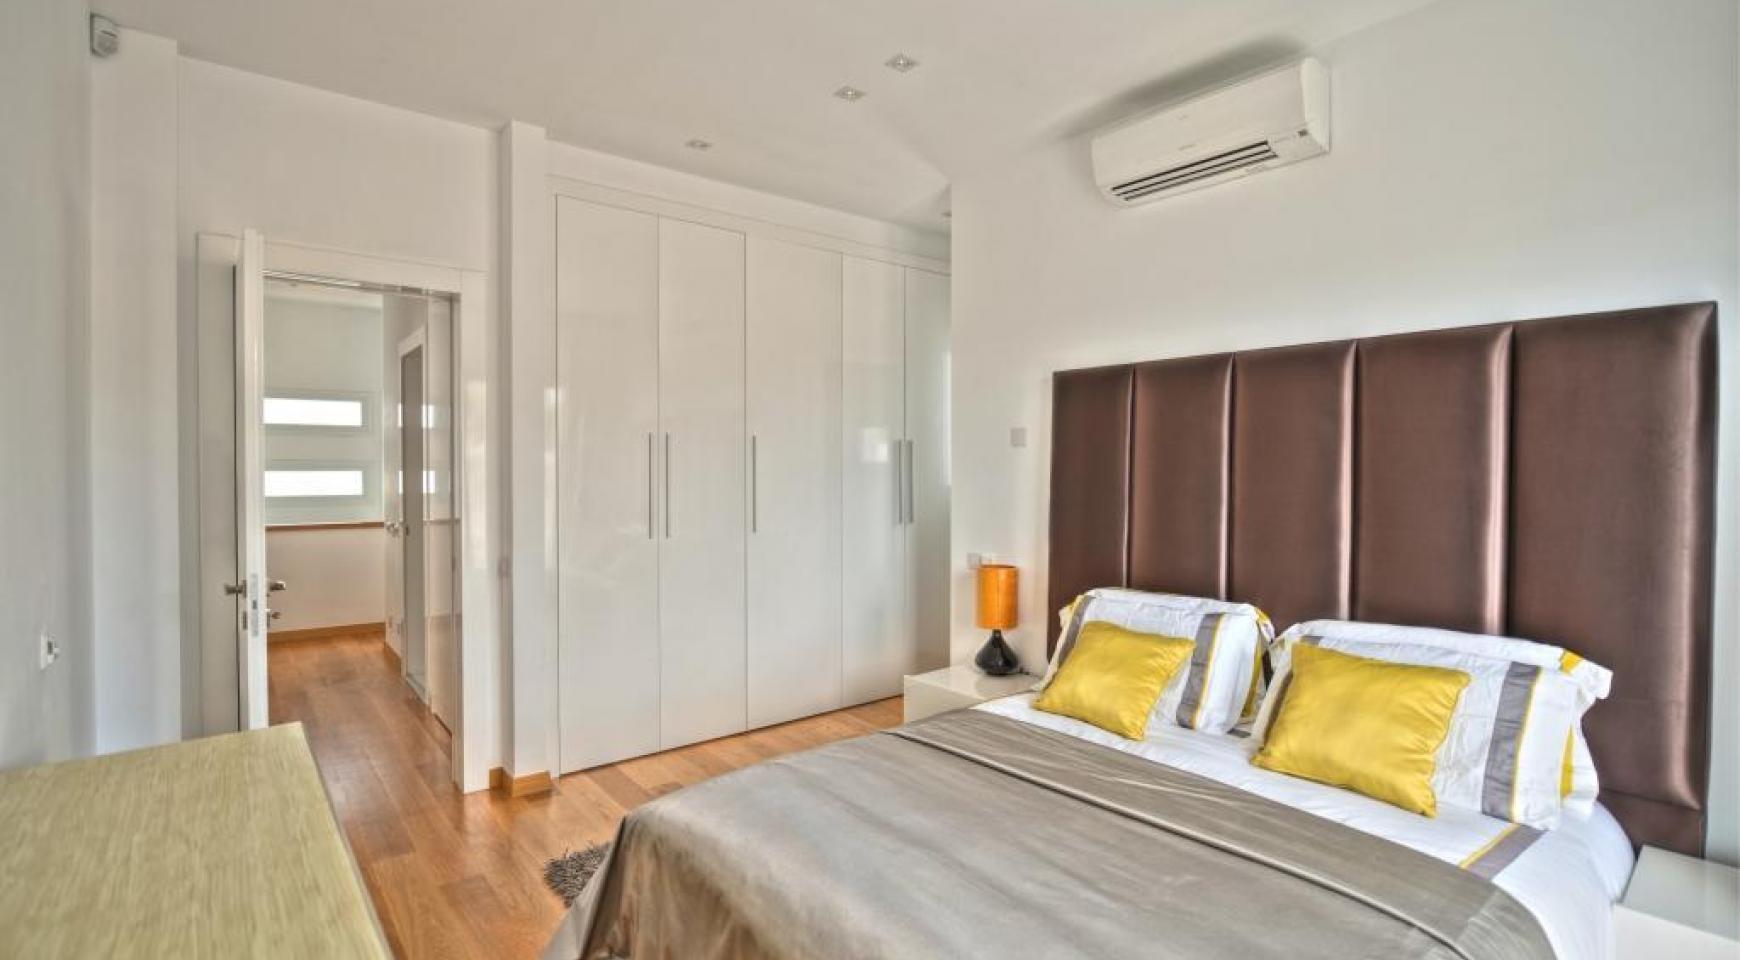 4-Спальная Вилла с Видом на Море в Районе Agios Tychonas - 11